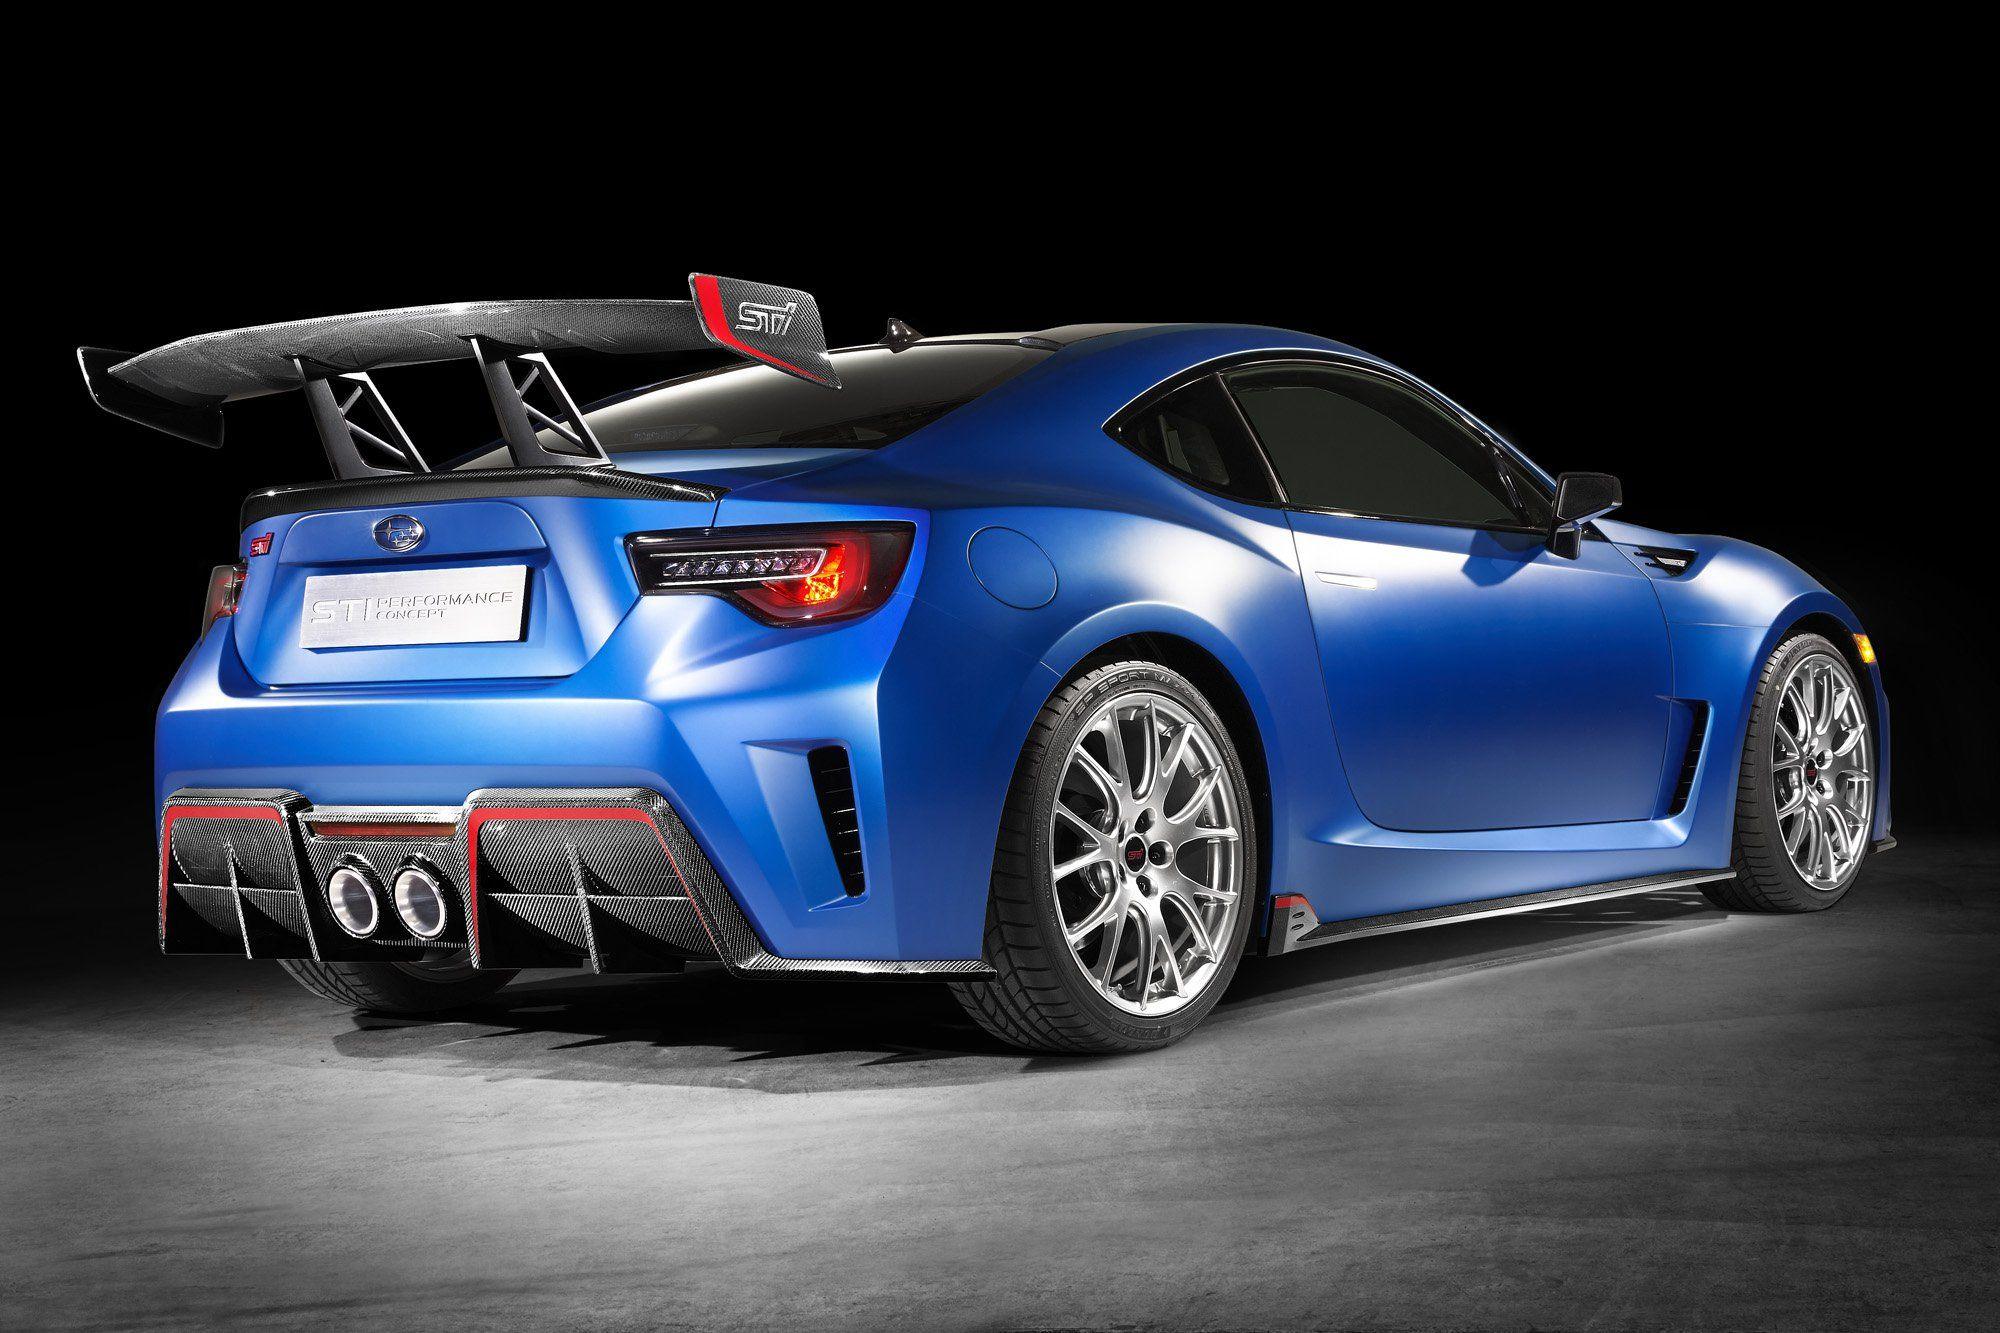 Subaru Sti Performance Concept Makes 350 Hp Autoguide News